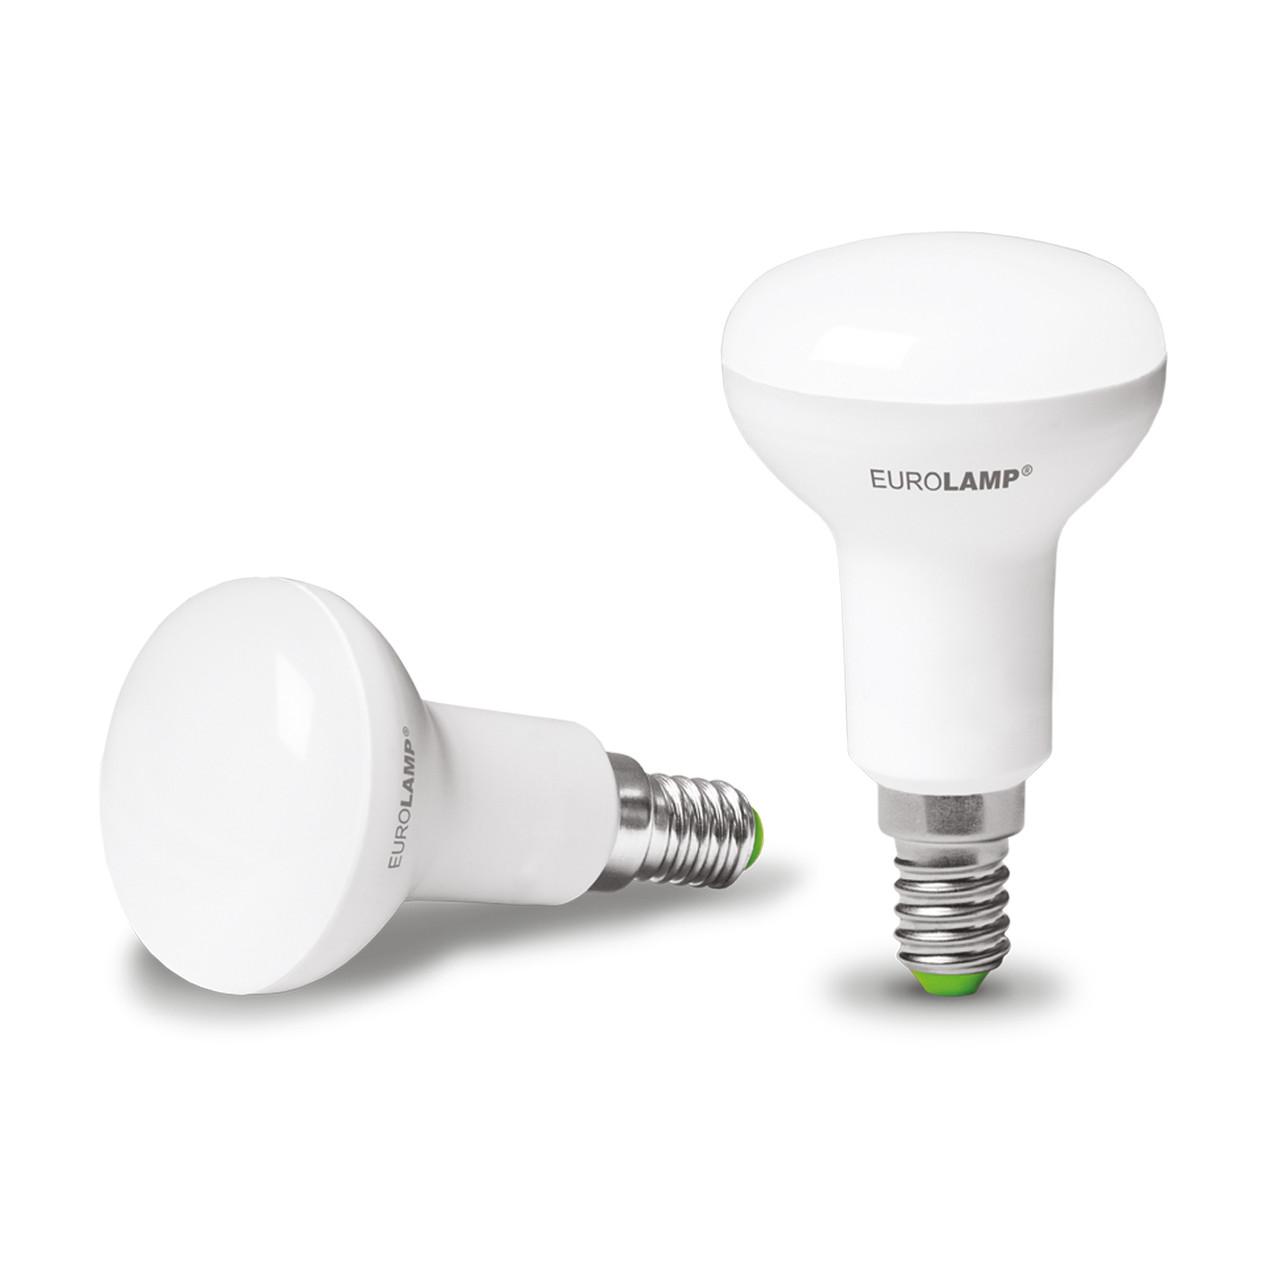 EUROLAMP LED Лампа ЕКО R50 6W E14 4000K, фото 1